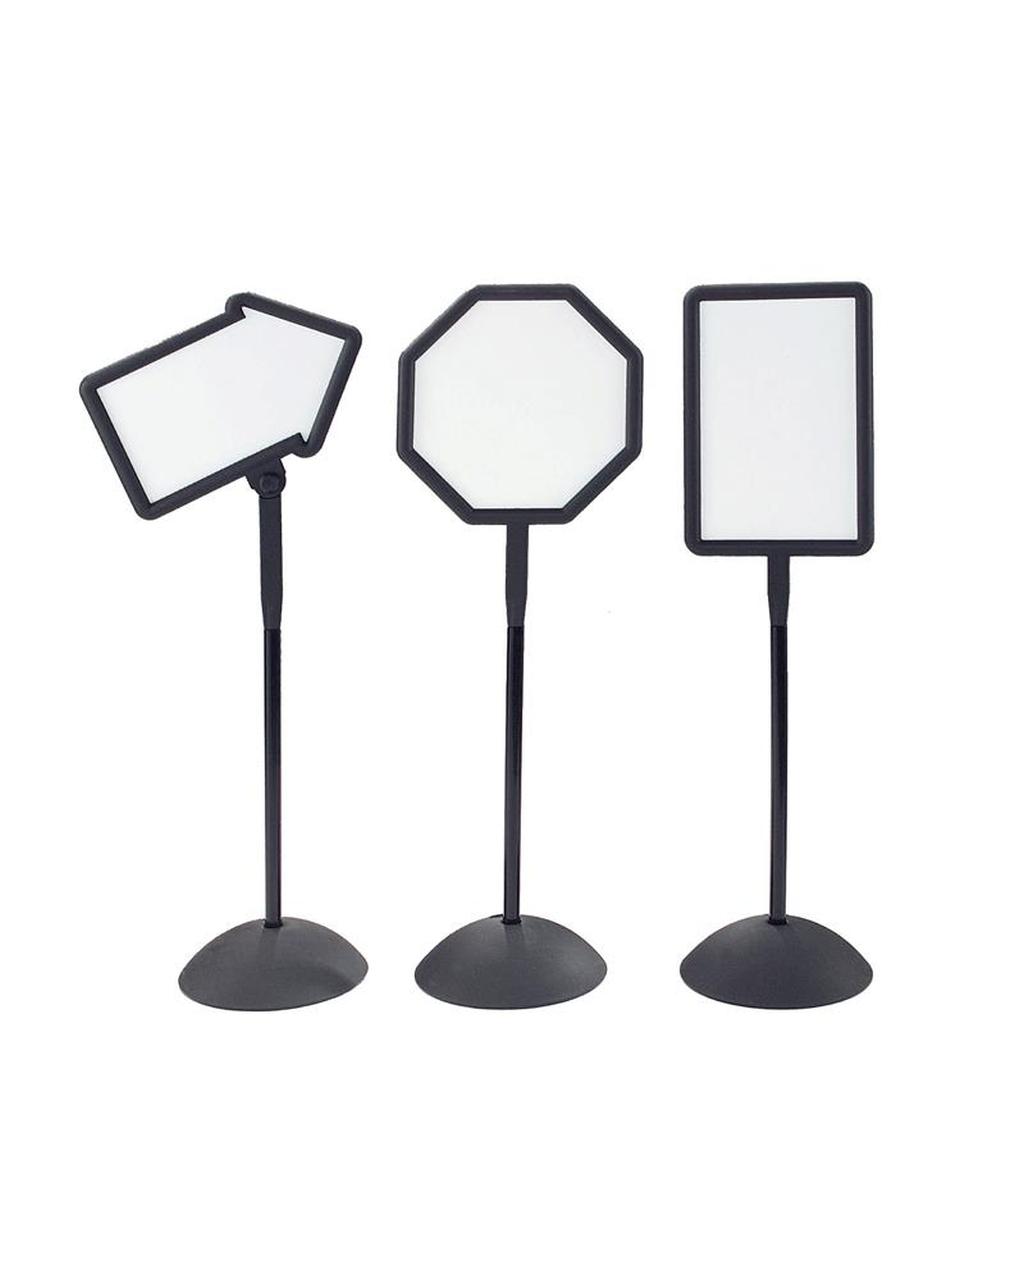 Freestanding Whiteboard Signs Arrow